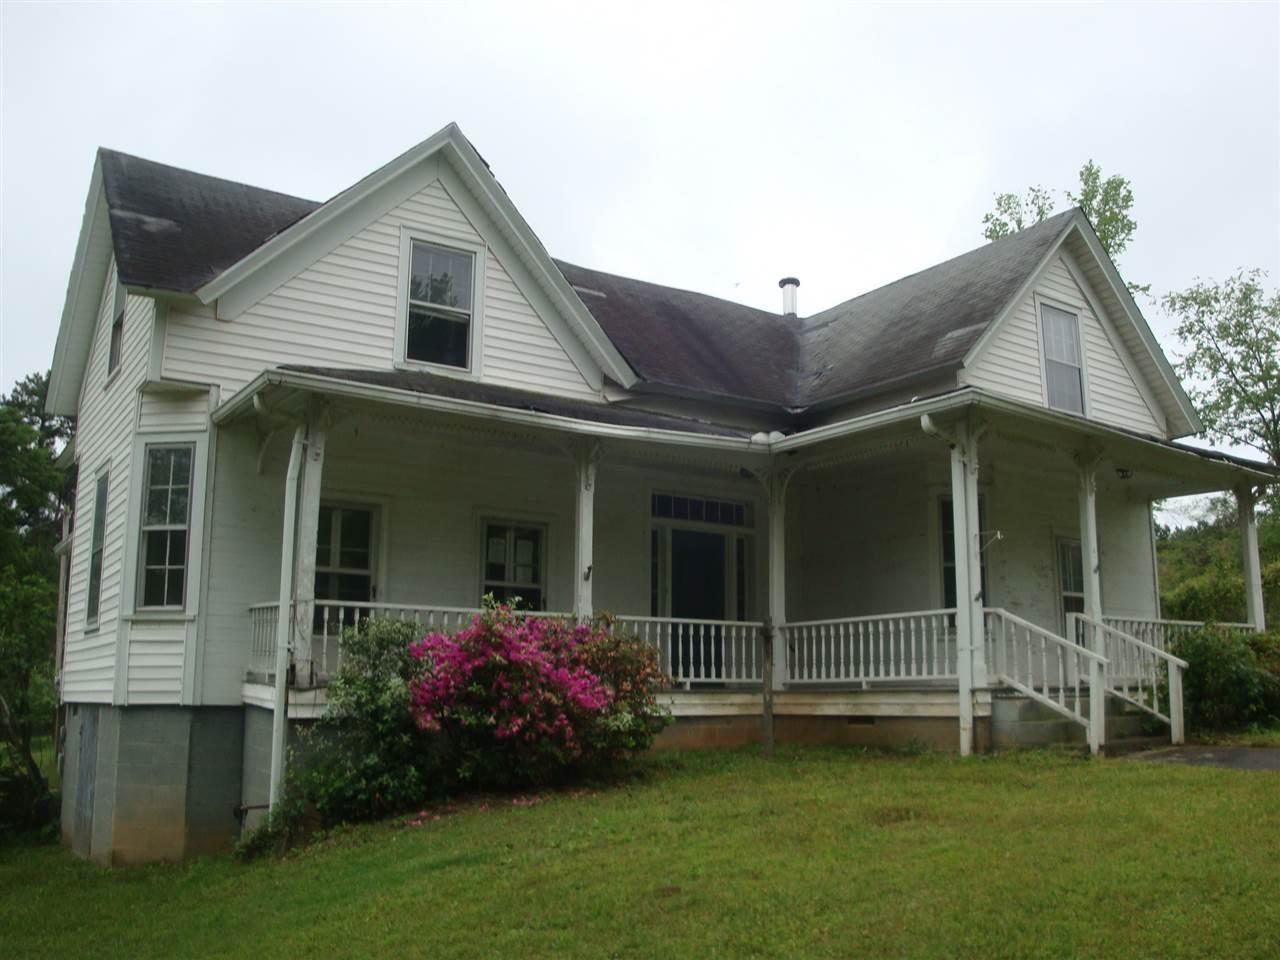 Real Estate for Sale, ListingId: 32891517, McCormick,SC29835